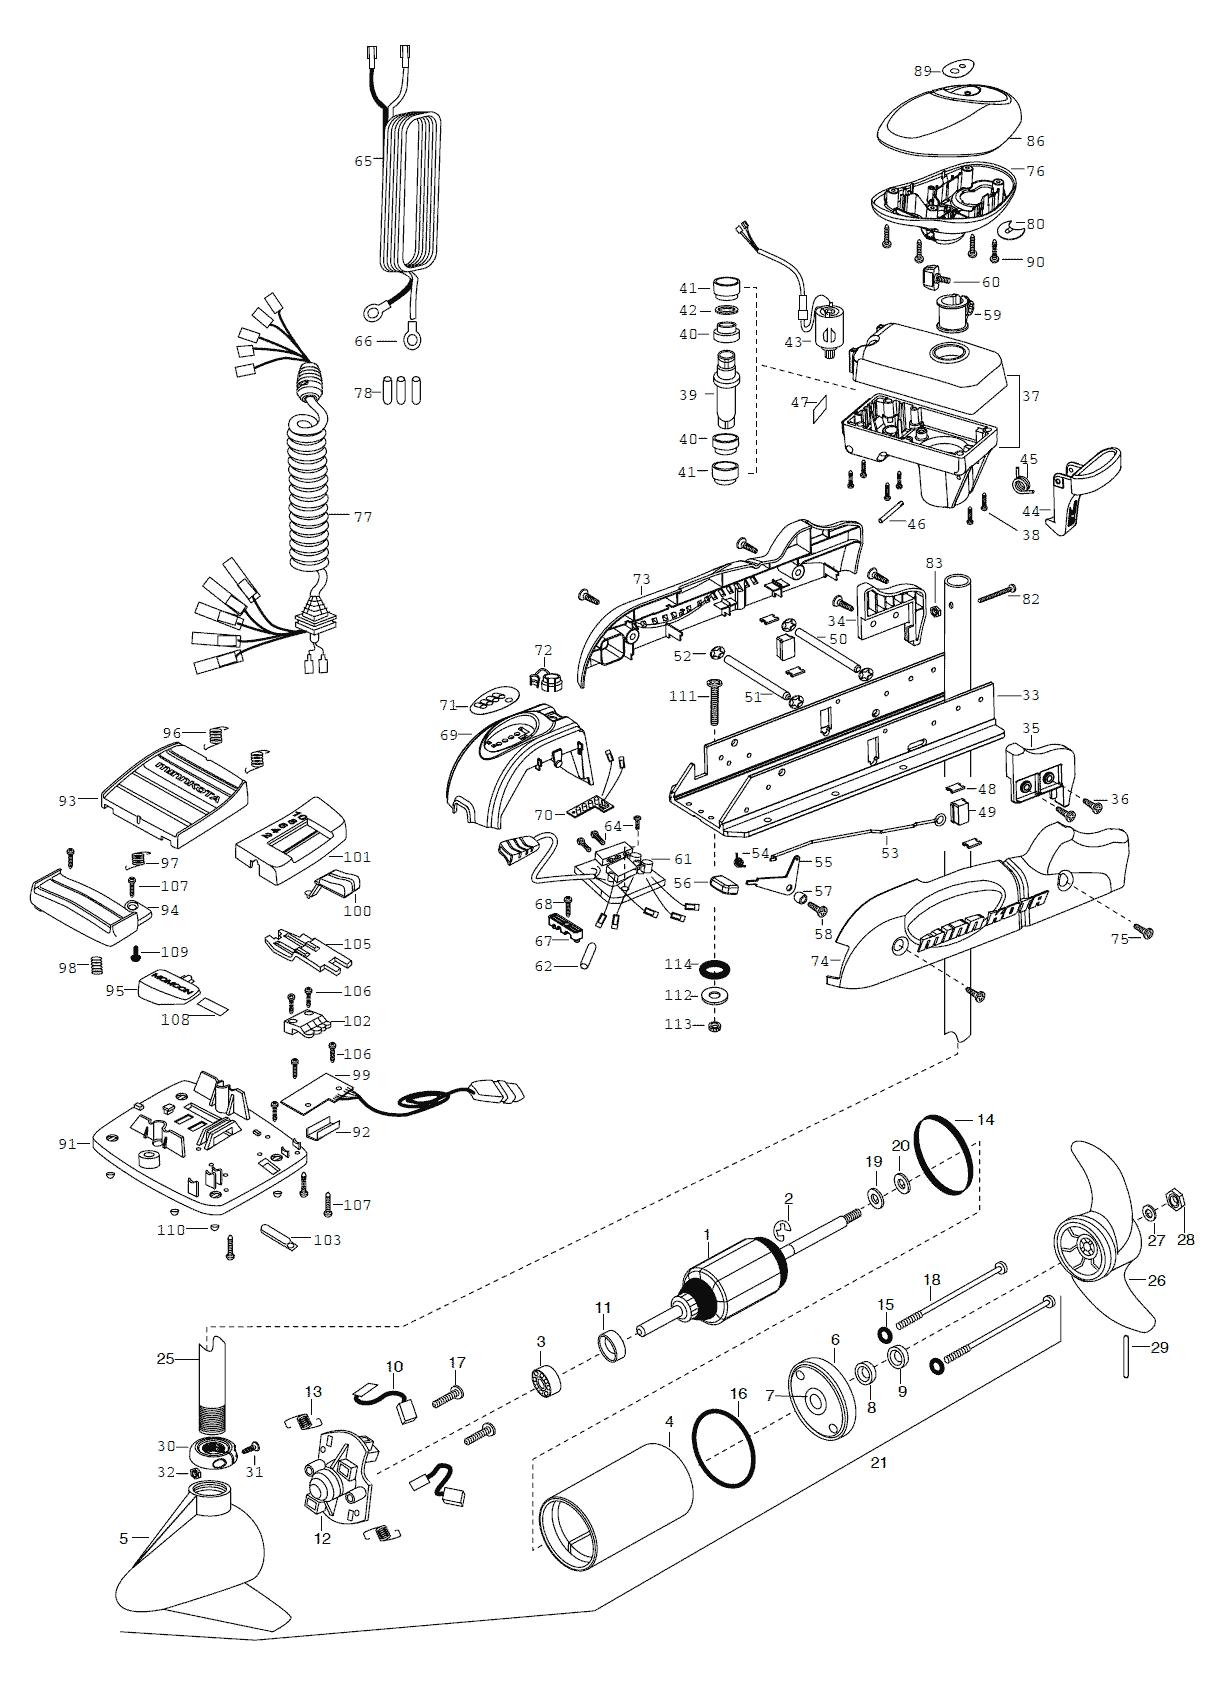 2003_MK_PowerDrive64pontoon Minn Kota Parts Schematic on honda parts schematic, minn kota trolling motor schematic, yamaha parts schematic, remington parts schematic, zebco parts schematic, suzuki parts schematic, minn kota endura schematic,